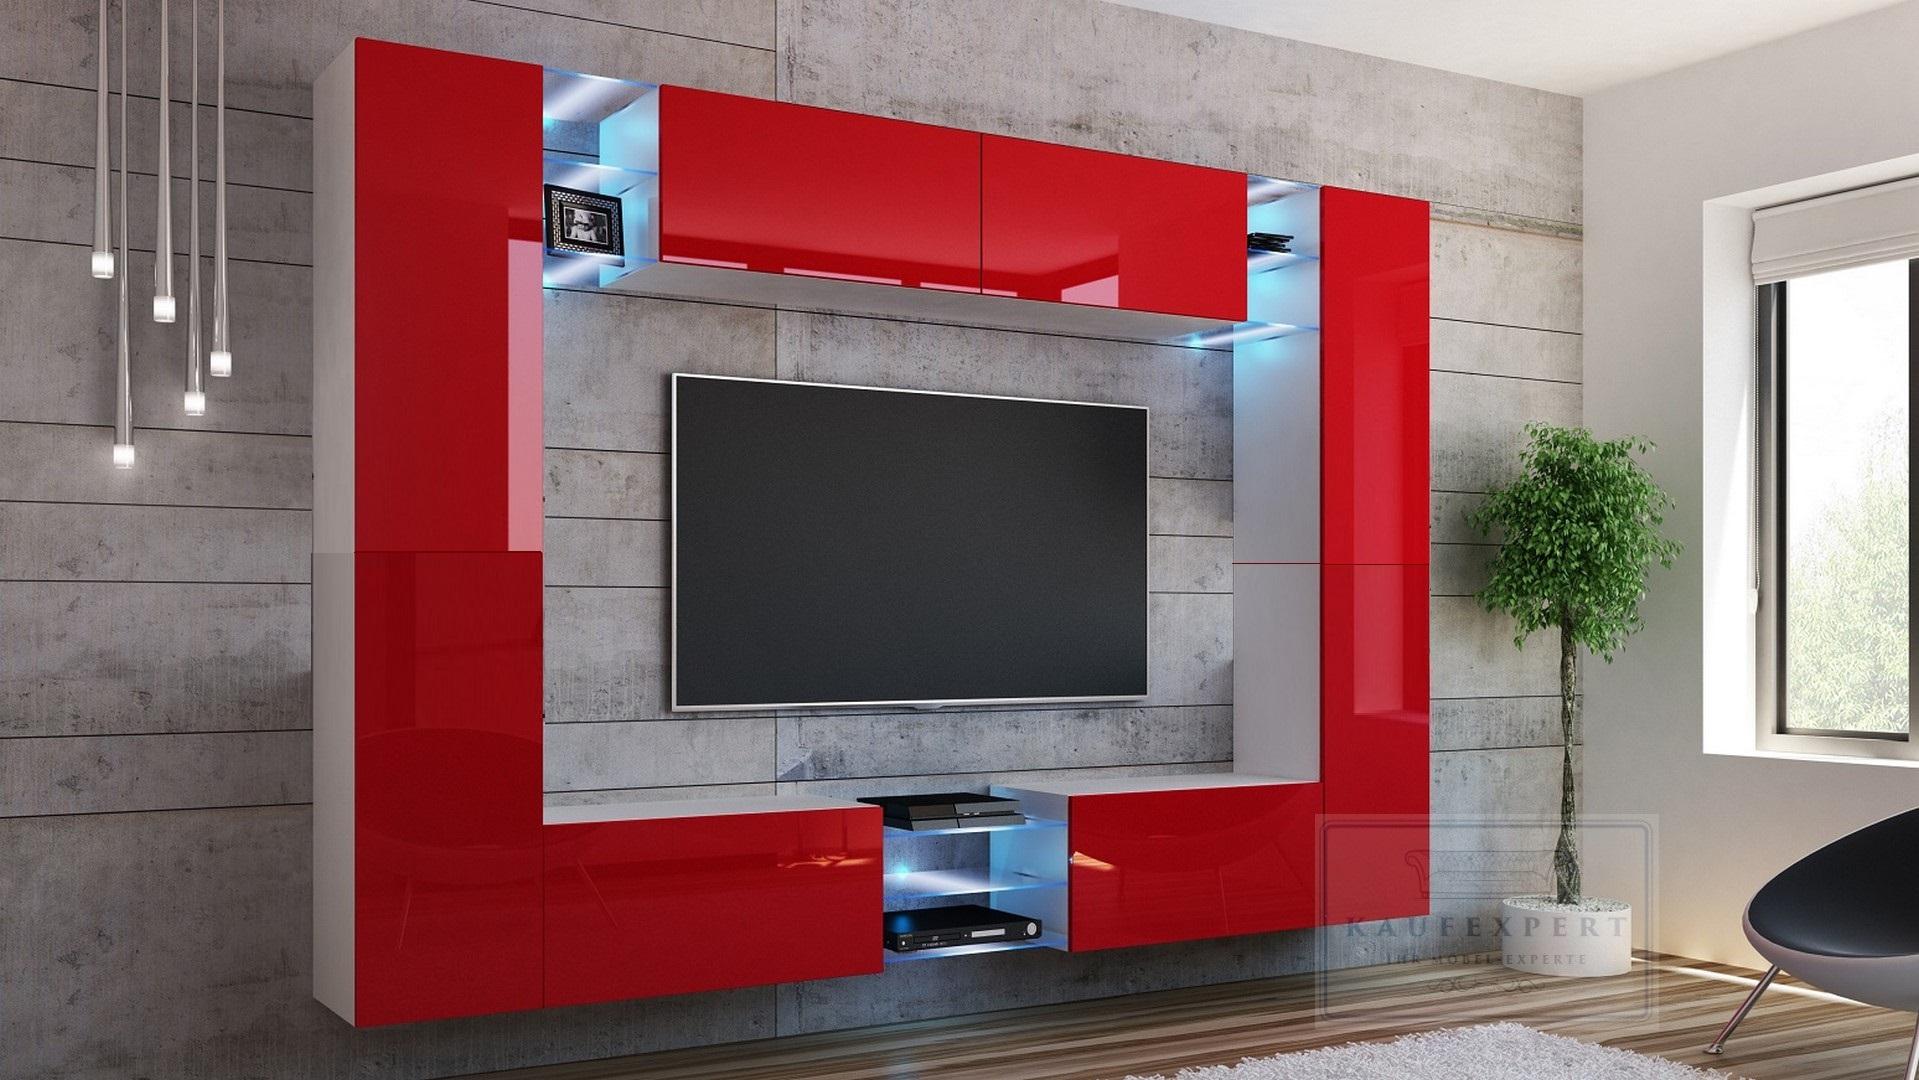 Tv Medienwand By Meine Gmbh With Tv Medienwand Good Wohnwand